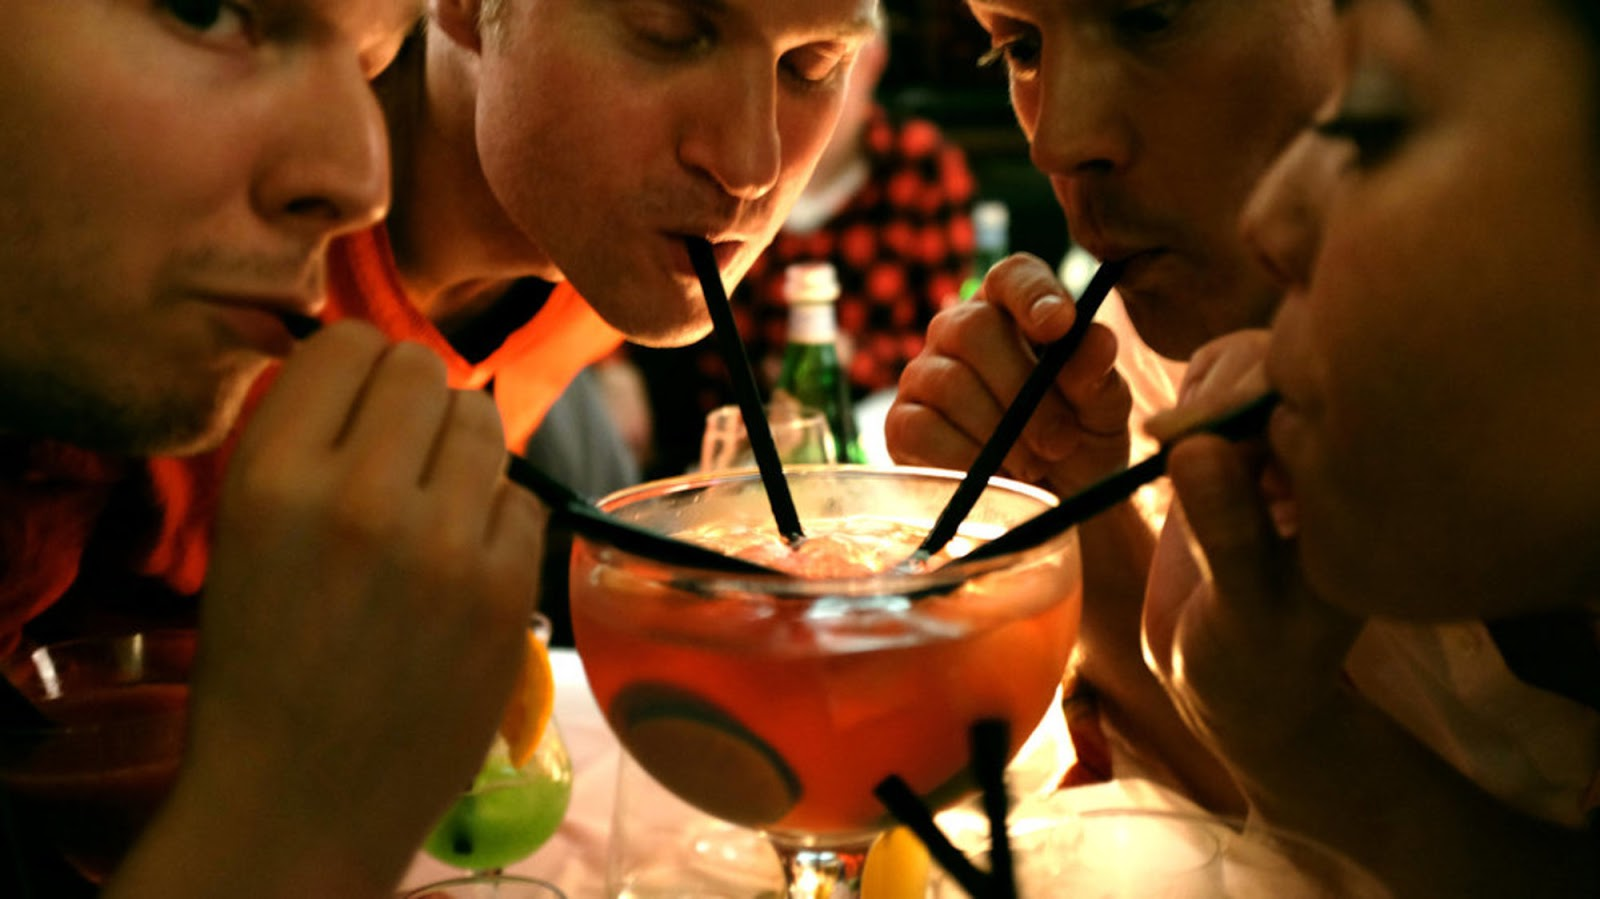 drinking, drunk, alcohol, smart